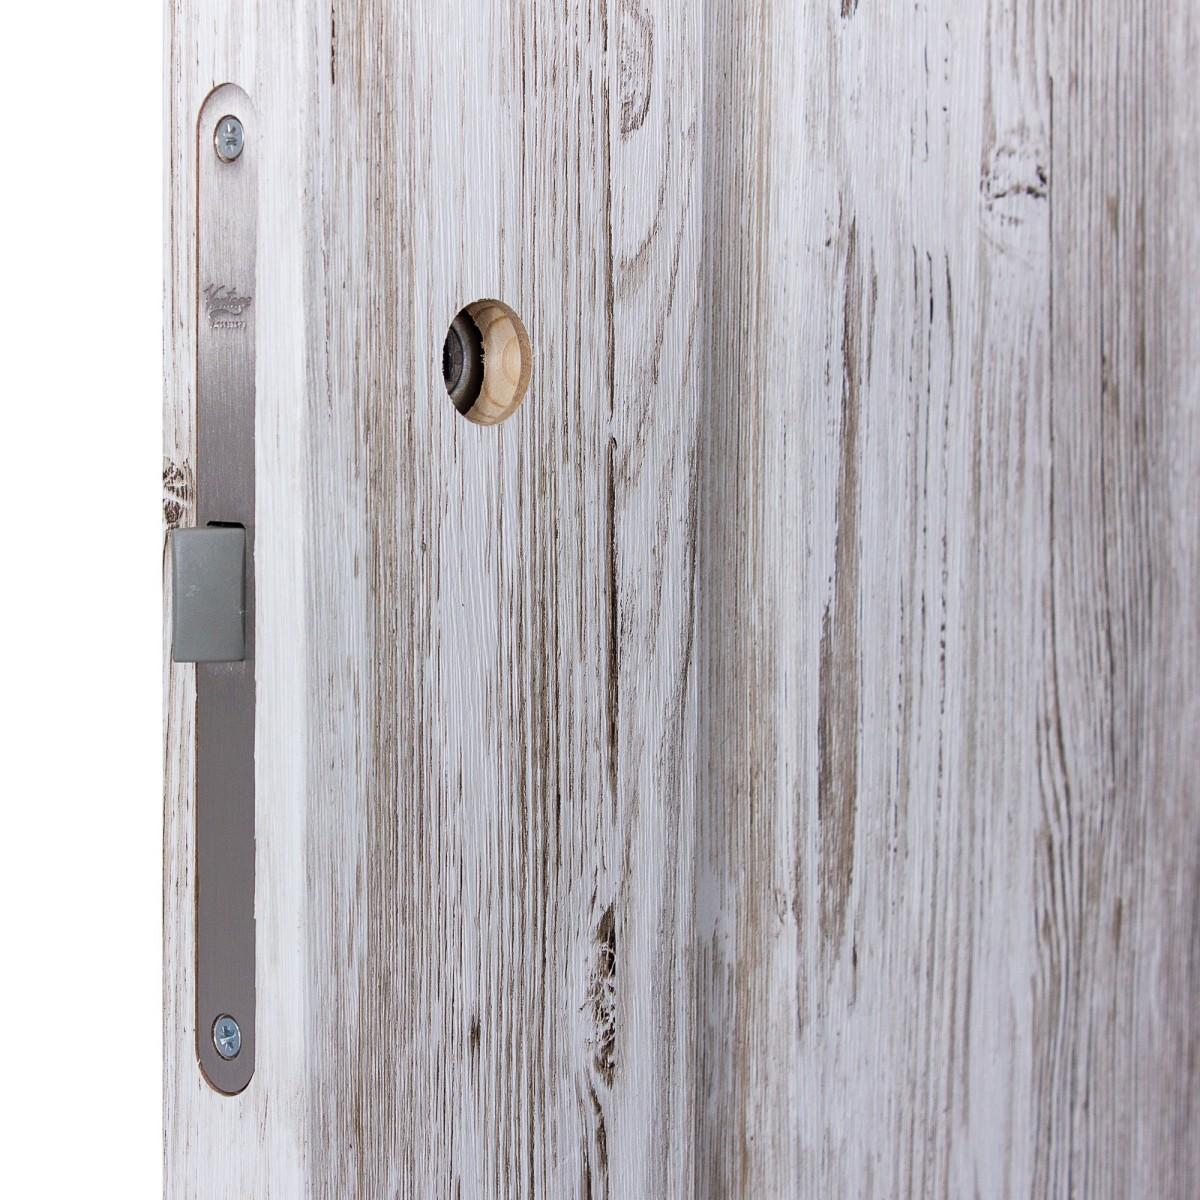 Дверь Межкомнатная Глухая Рустик 70x200 Цвет Северная Сосна